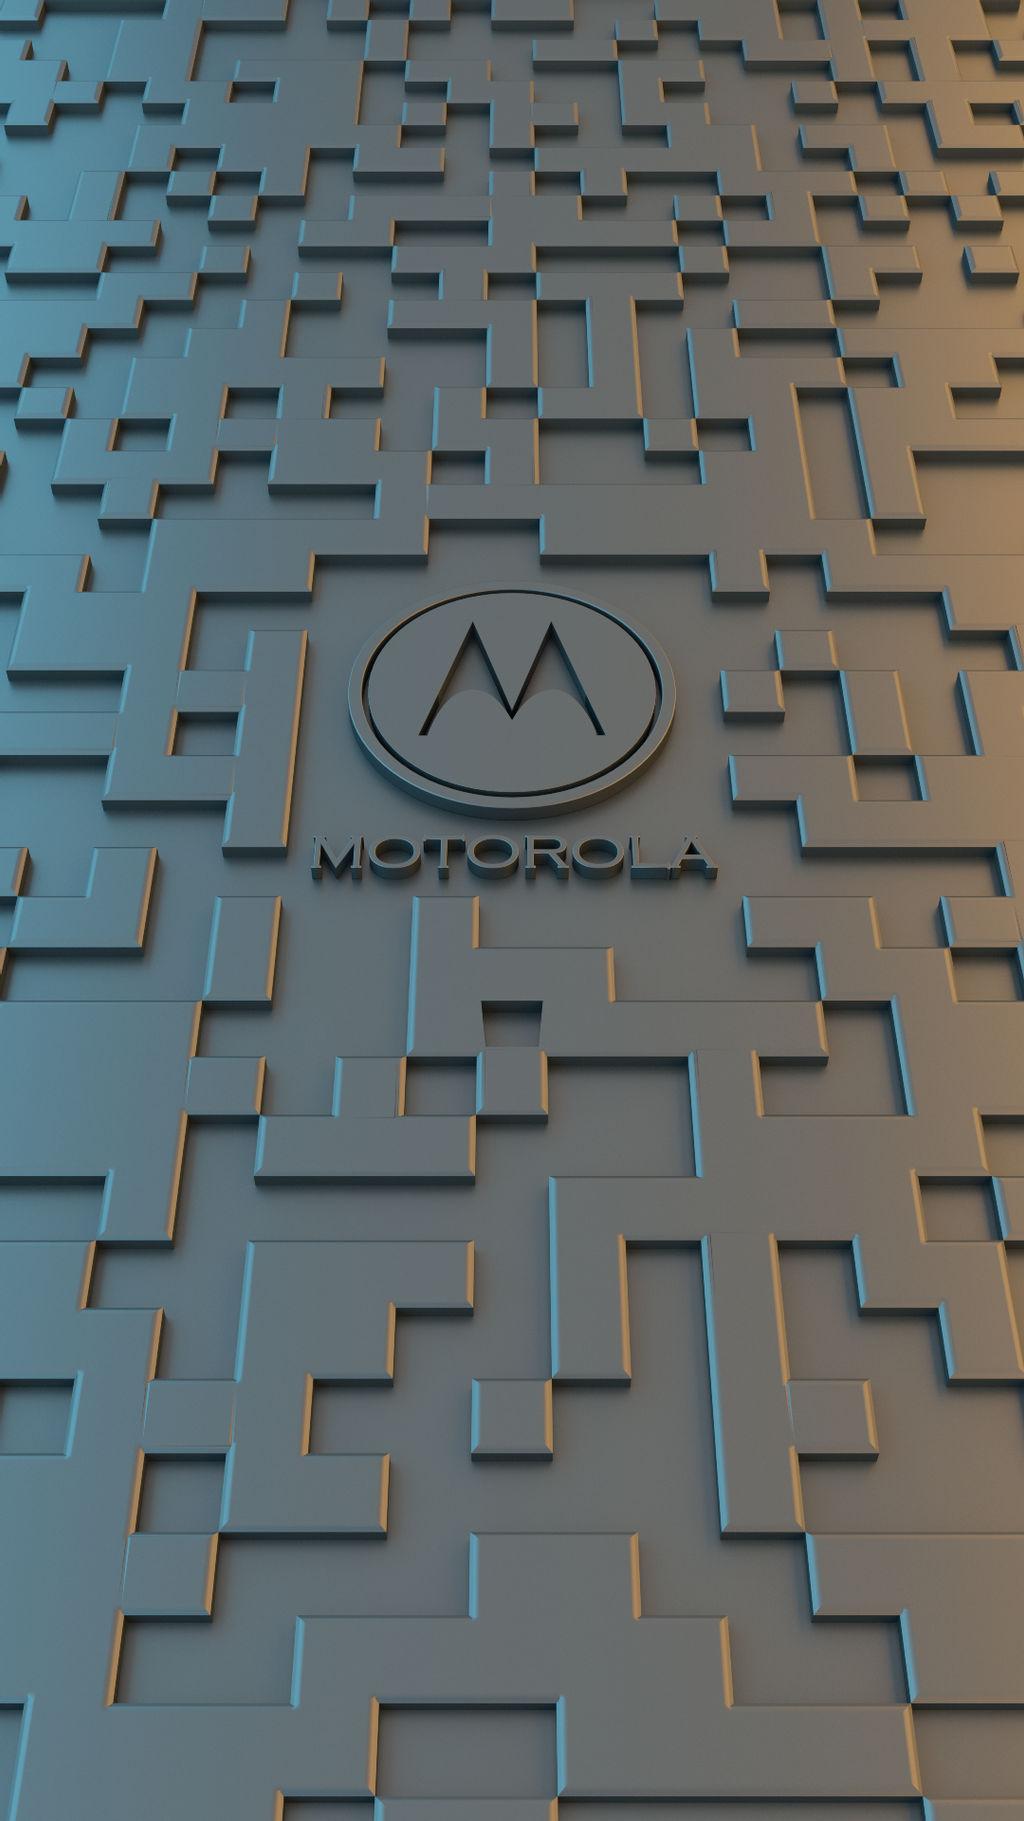 Motorola Wallpaper 2 by ECropp 1024x1821